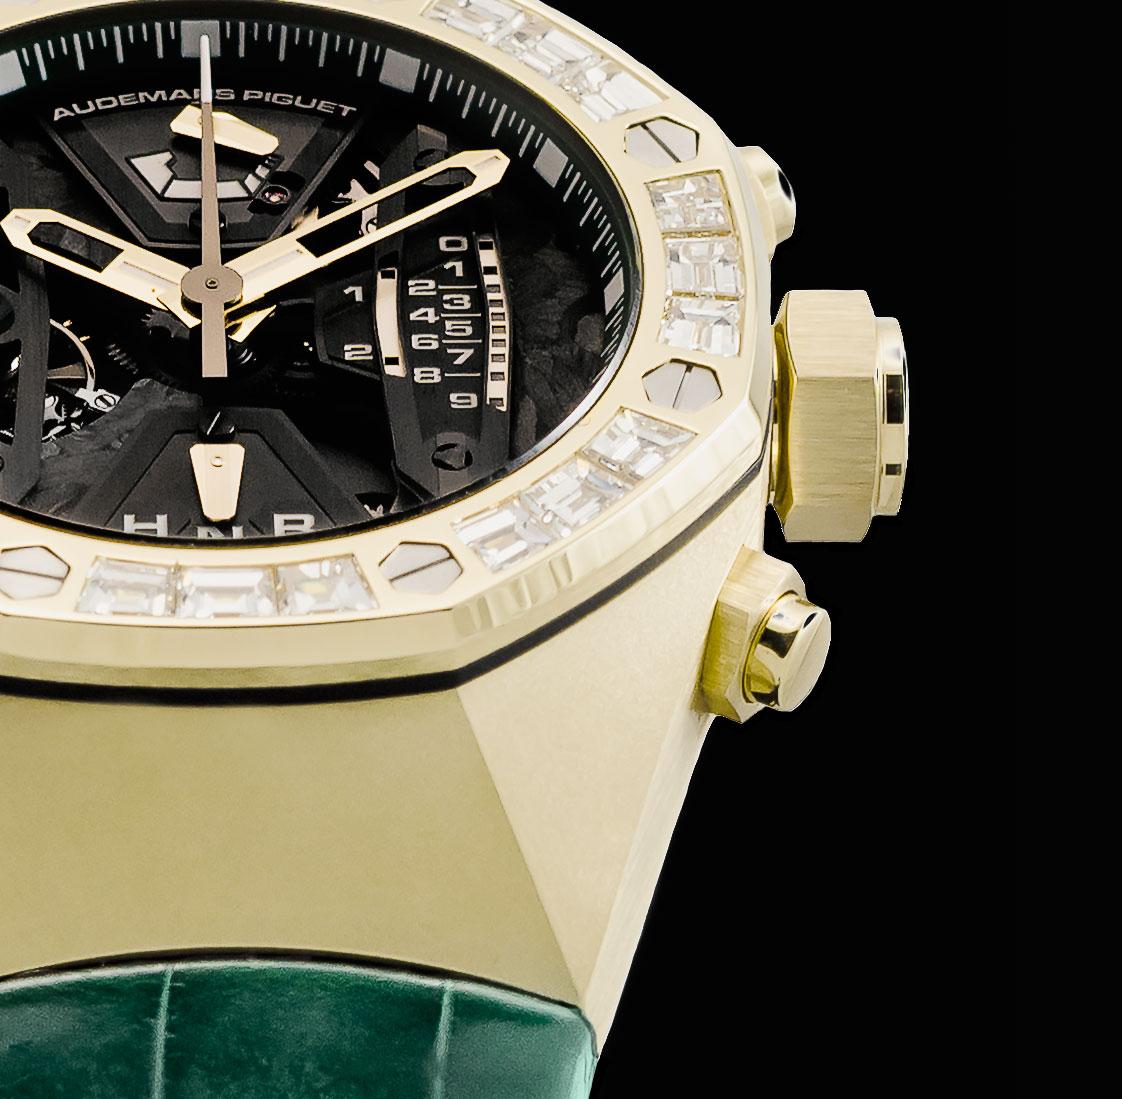 Audemars Piguet Royal Oak Concept Tourbillon Chronograph yellow gold THG 2